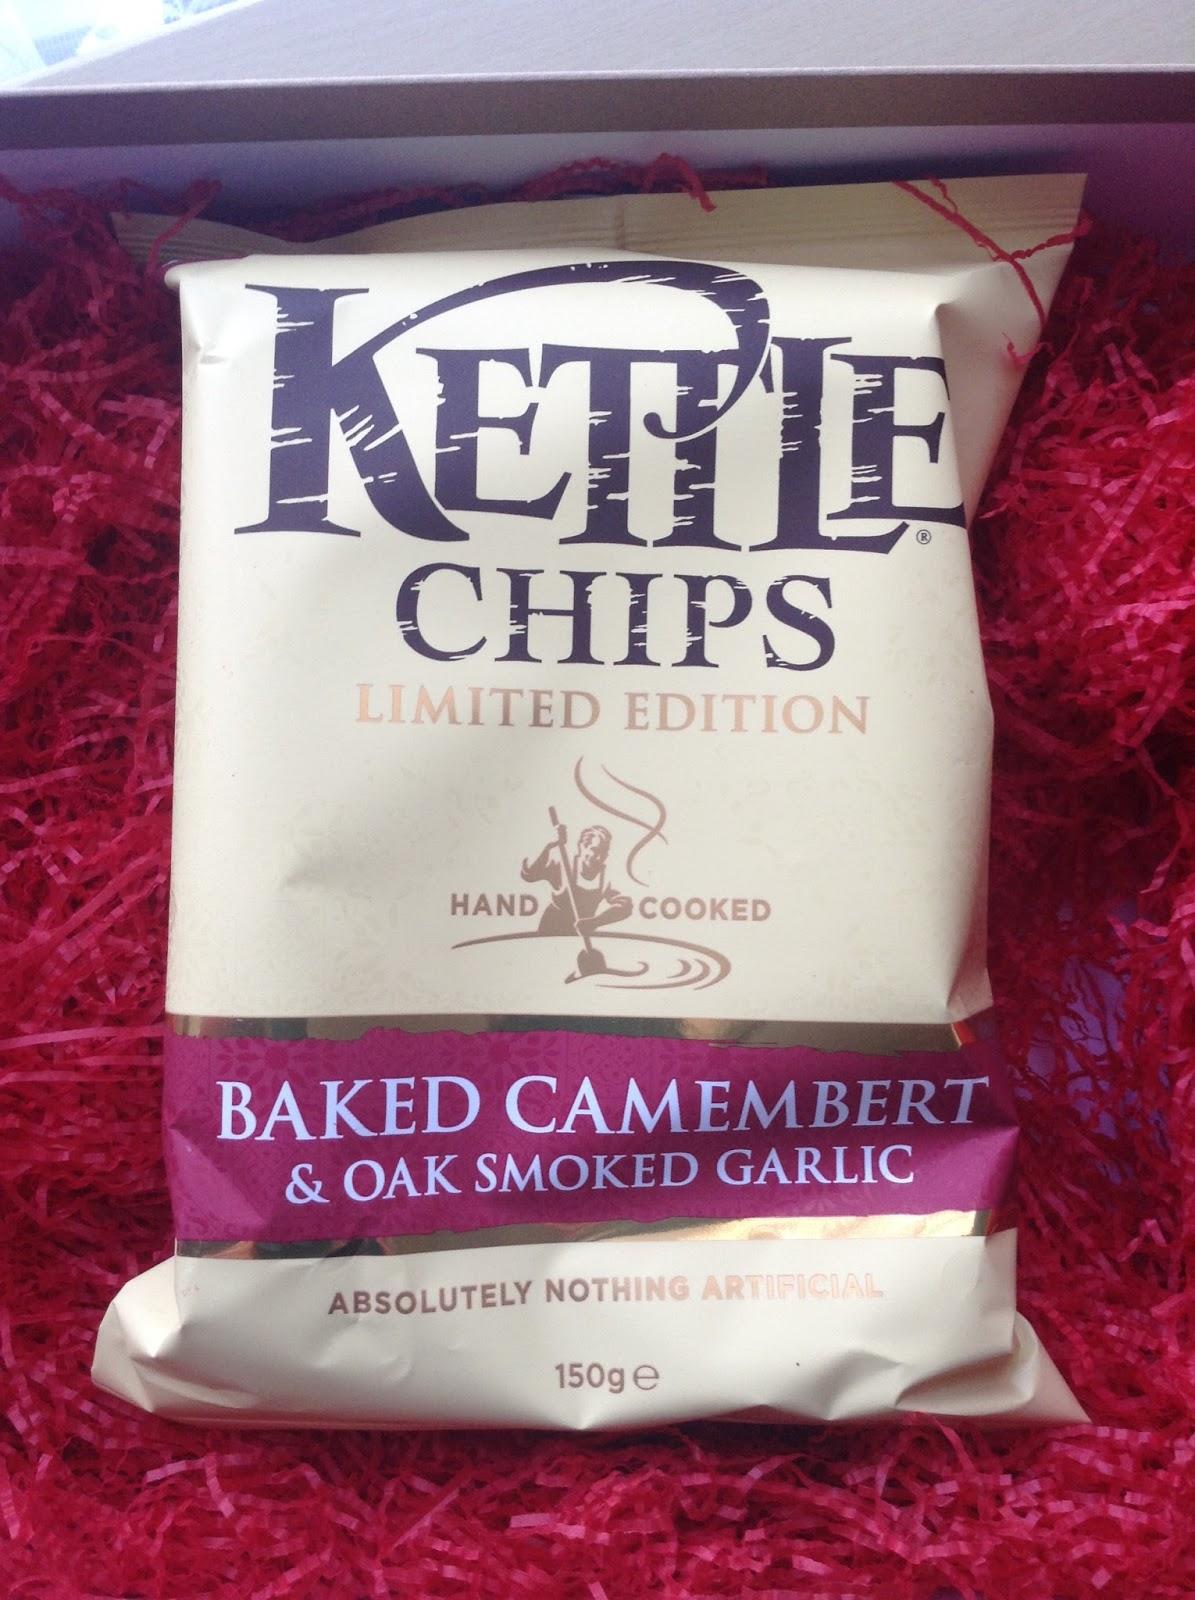 kevs snack reviews kettle chips baked camembert amp oak